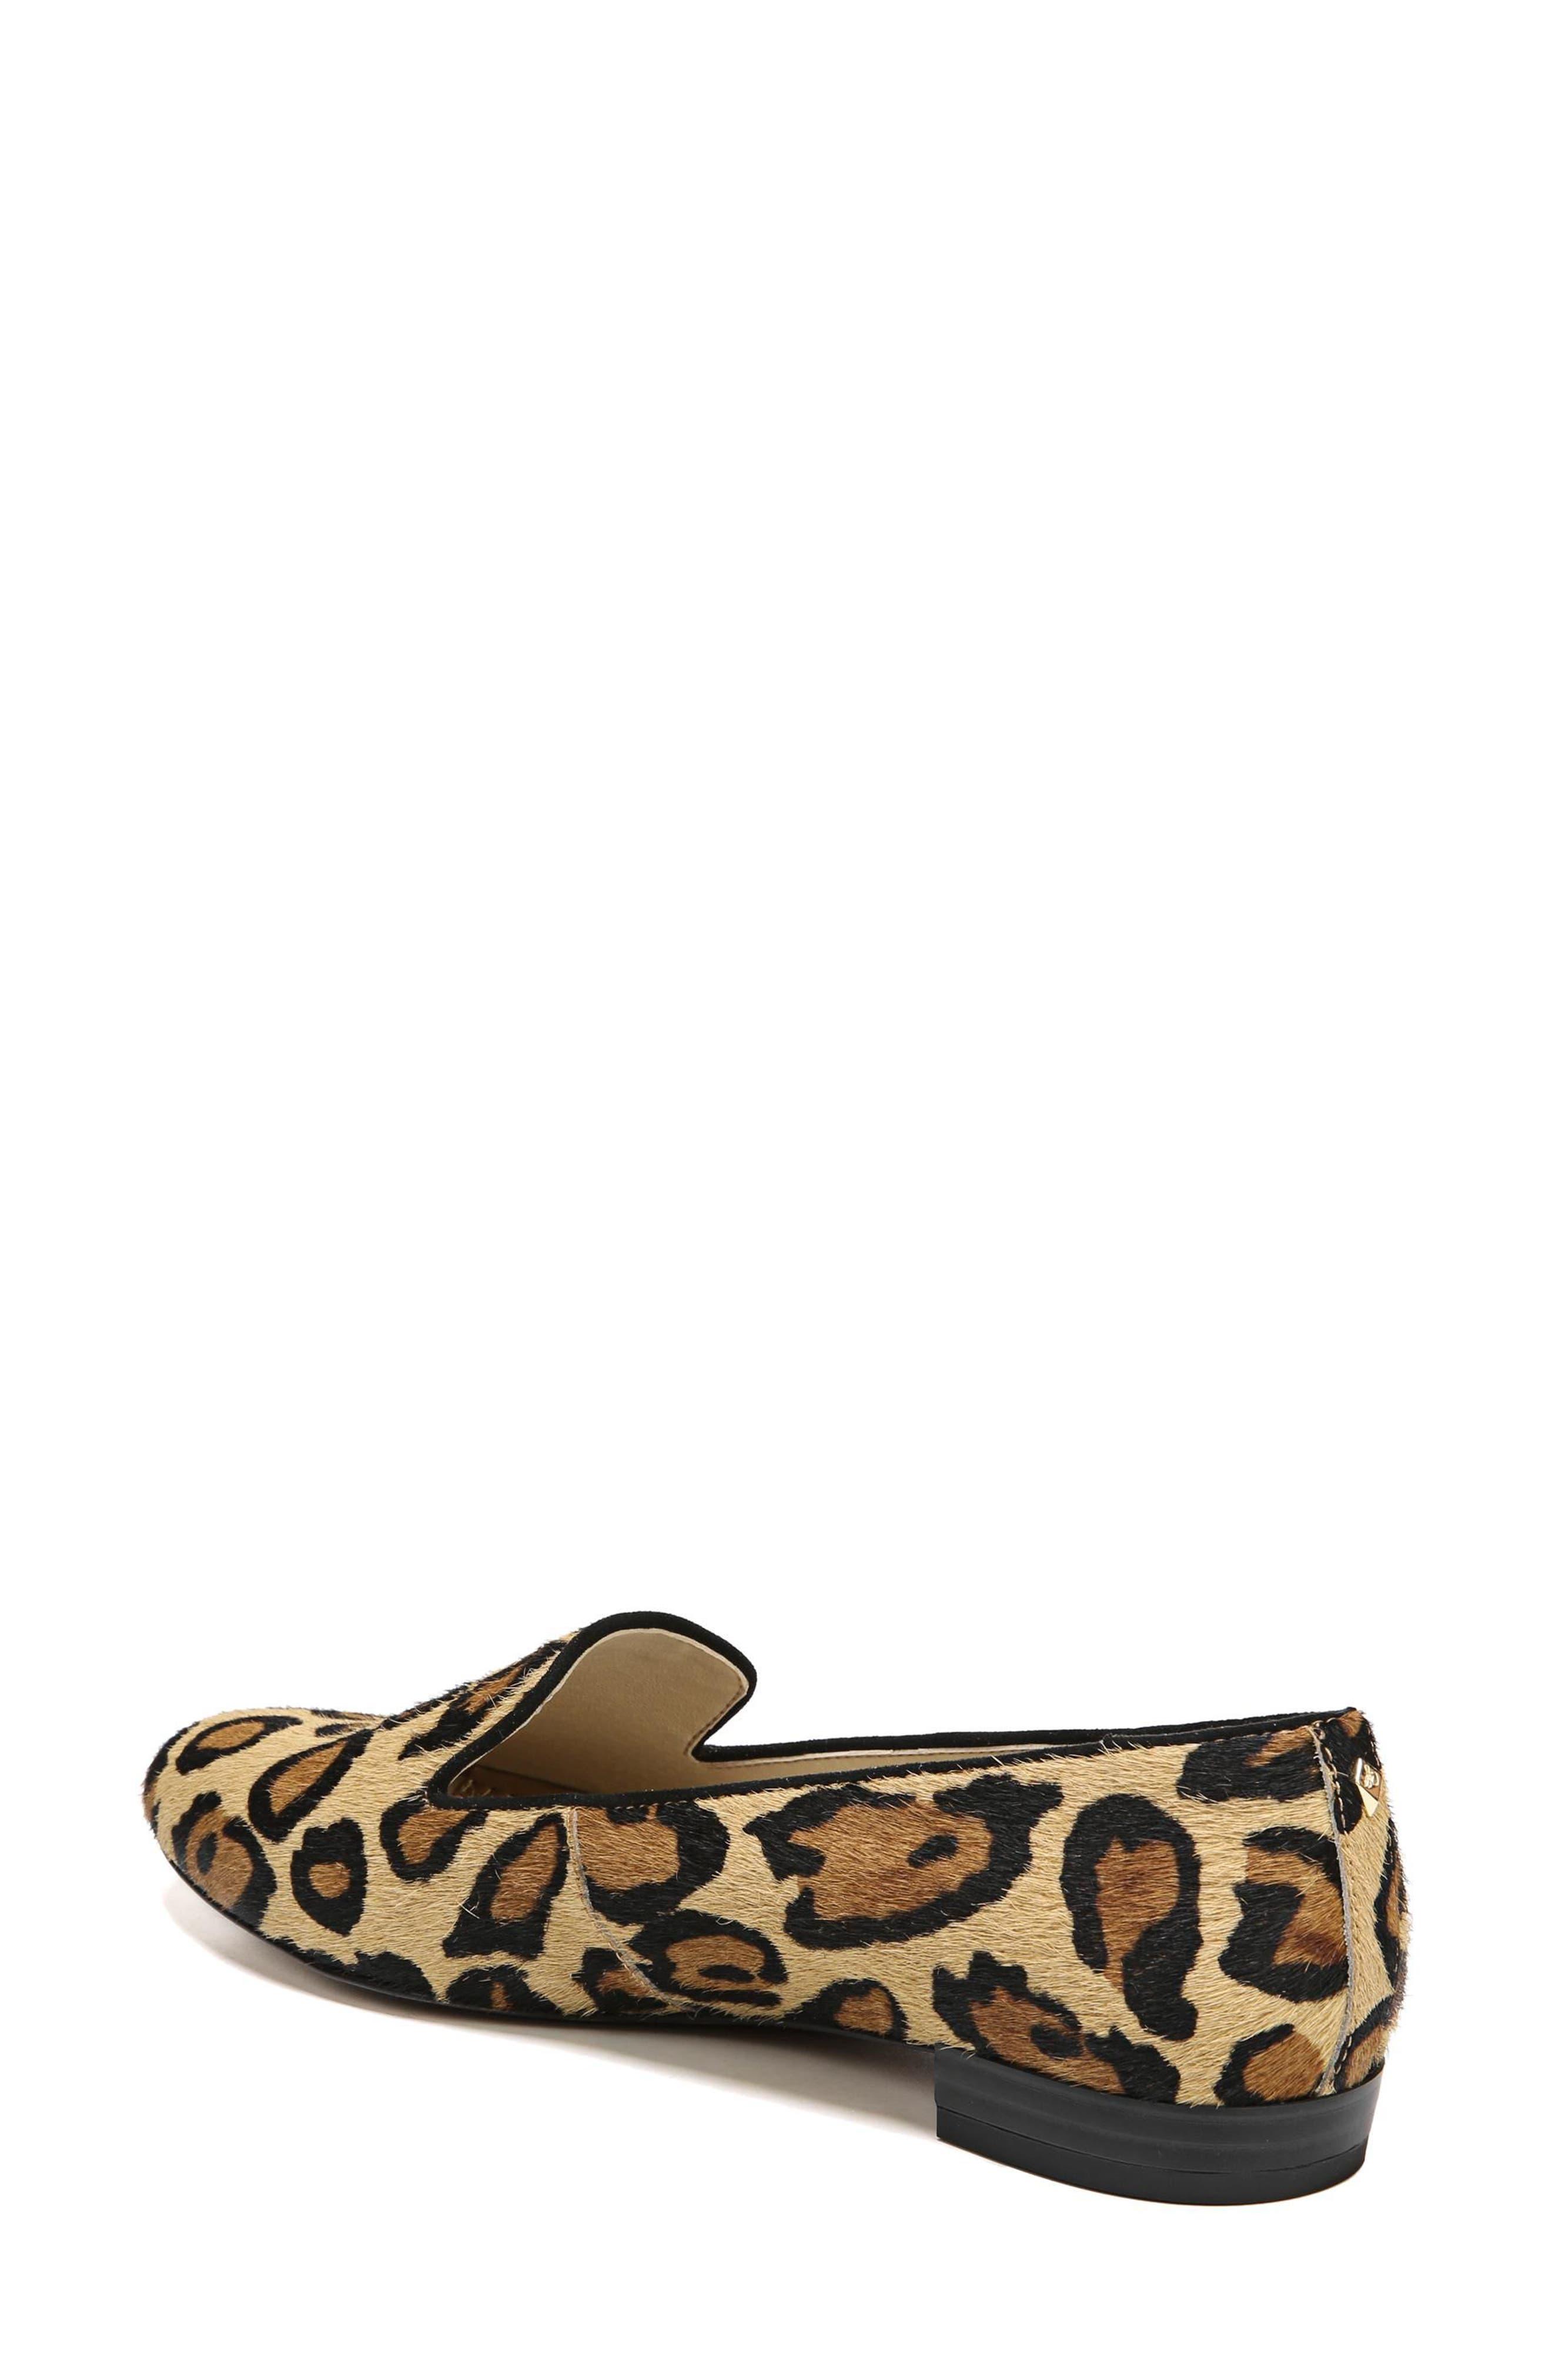 Jordy Genuine Calf Hair Flat,                             Alternate thumbnail 2, color,                             New Nude Leopard Brahma Hair